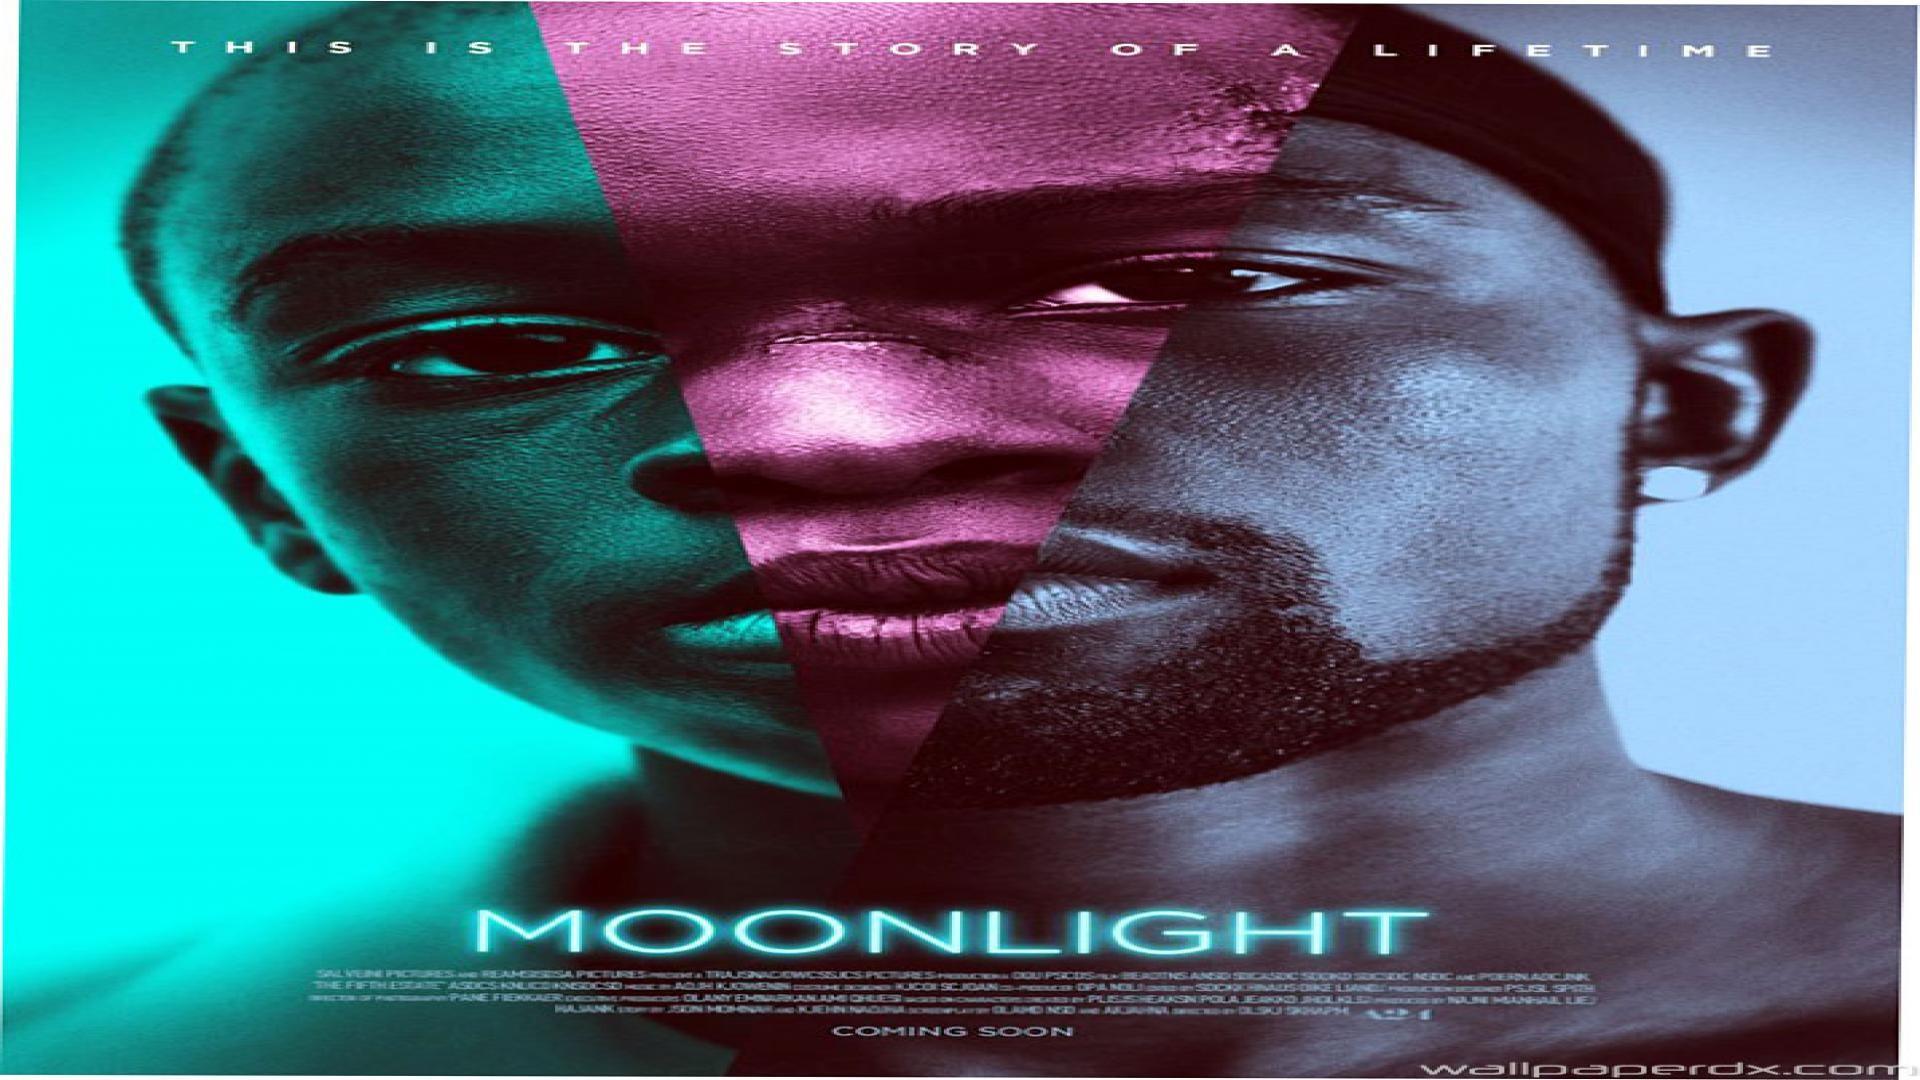 Moonlight (2016), Directed by Barry Jenkins, by Jon